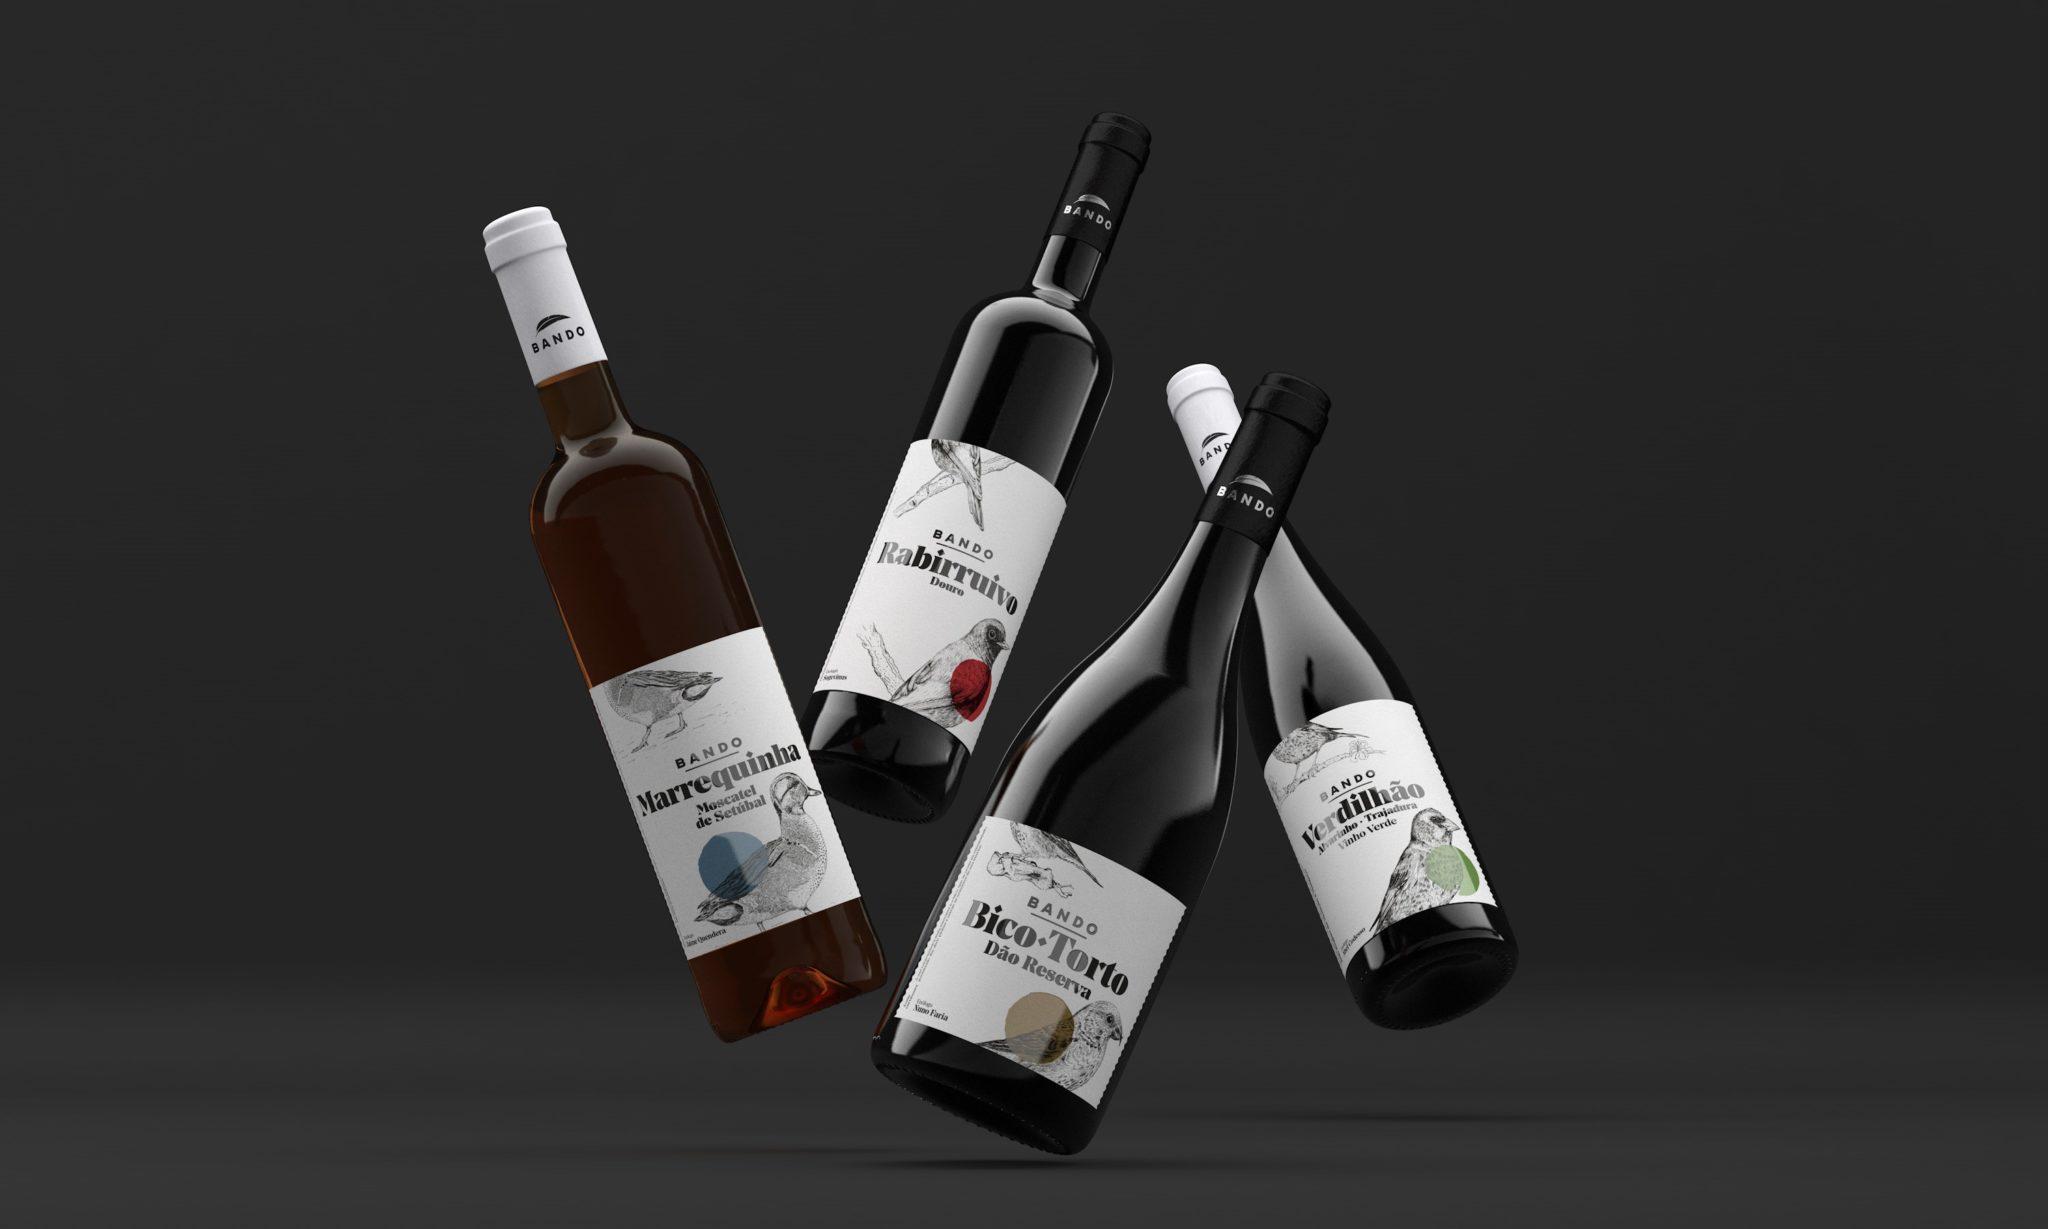 Auchan Vinhos